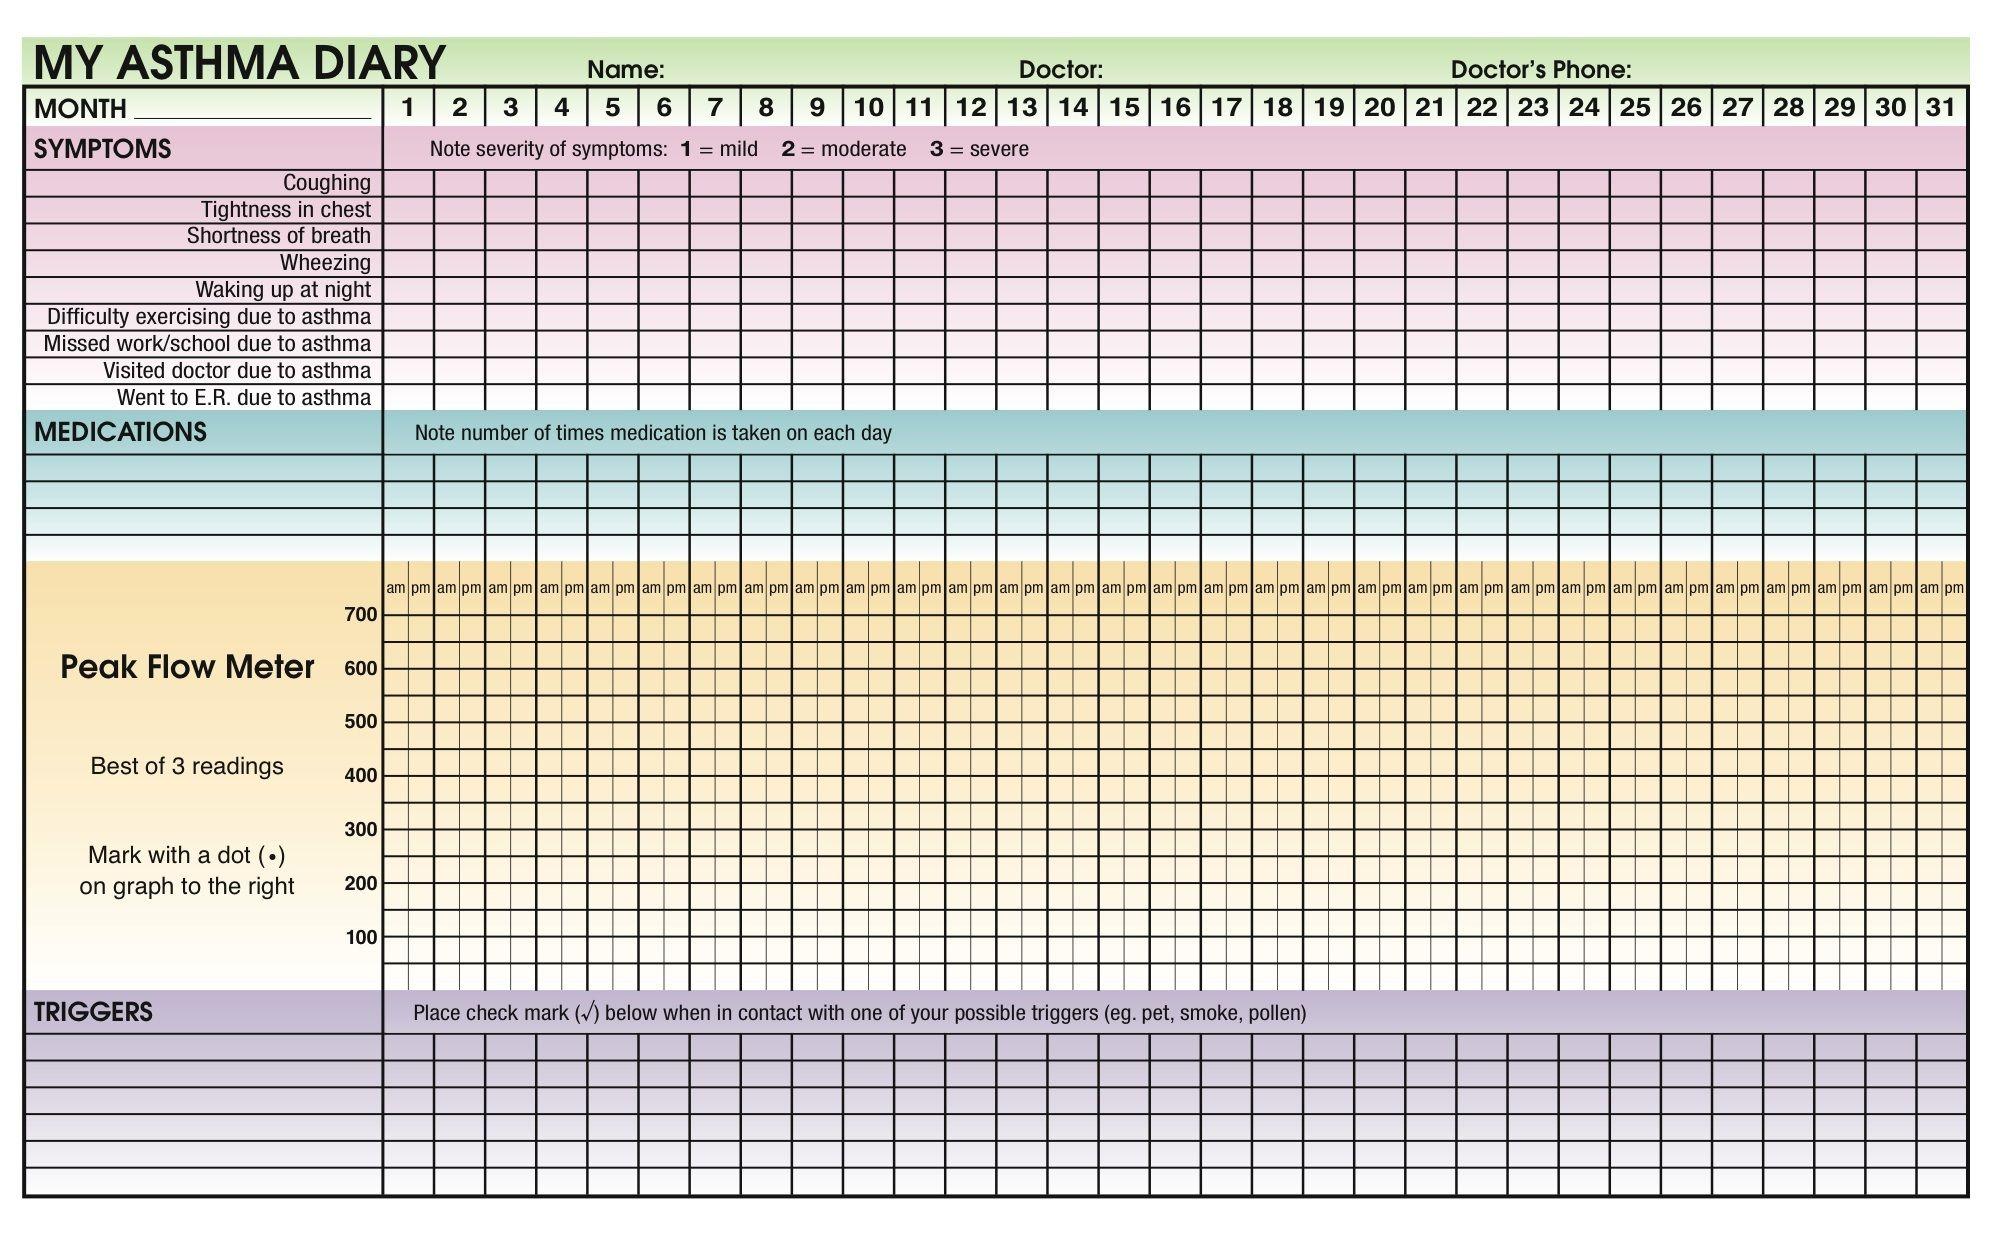 Asthma Diary Inside Jpg 1 990 1 233 Pixels Asthma Allergy Asthma Lungs Health